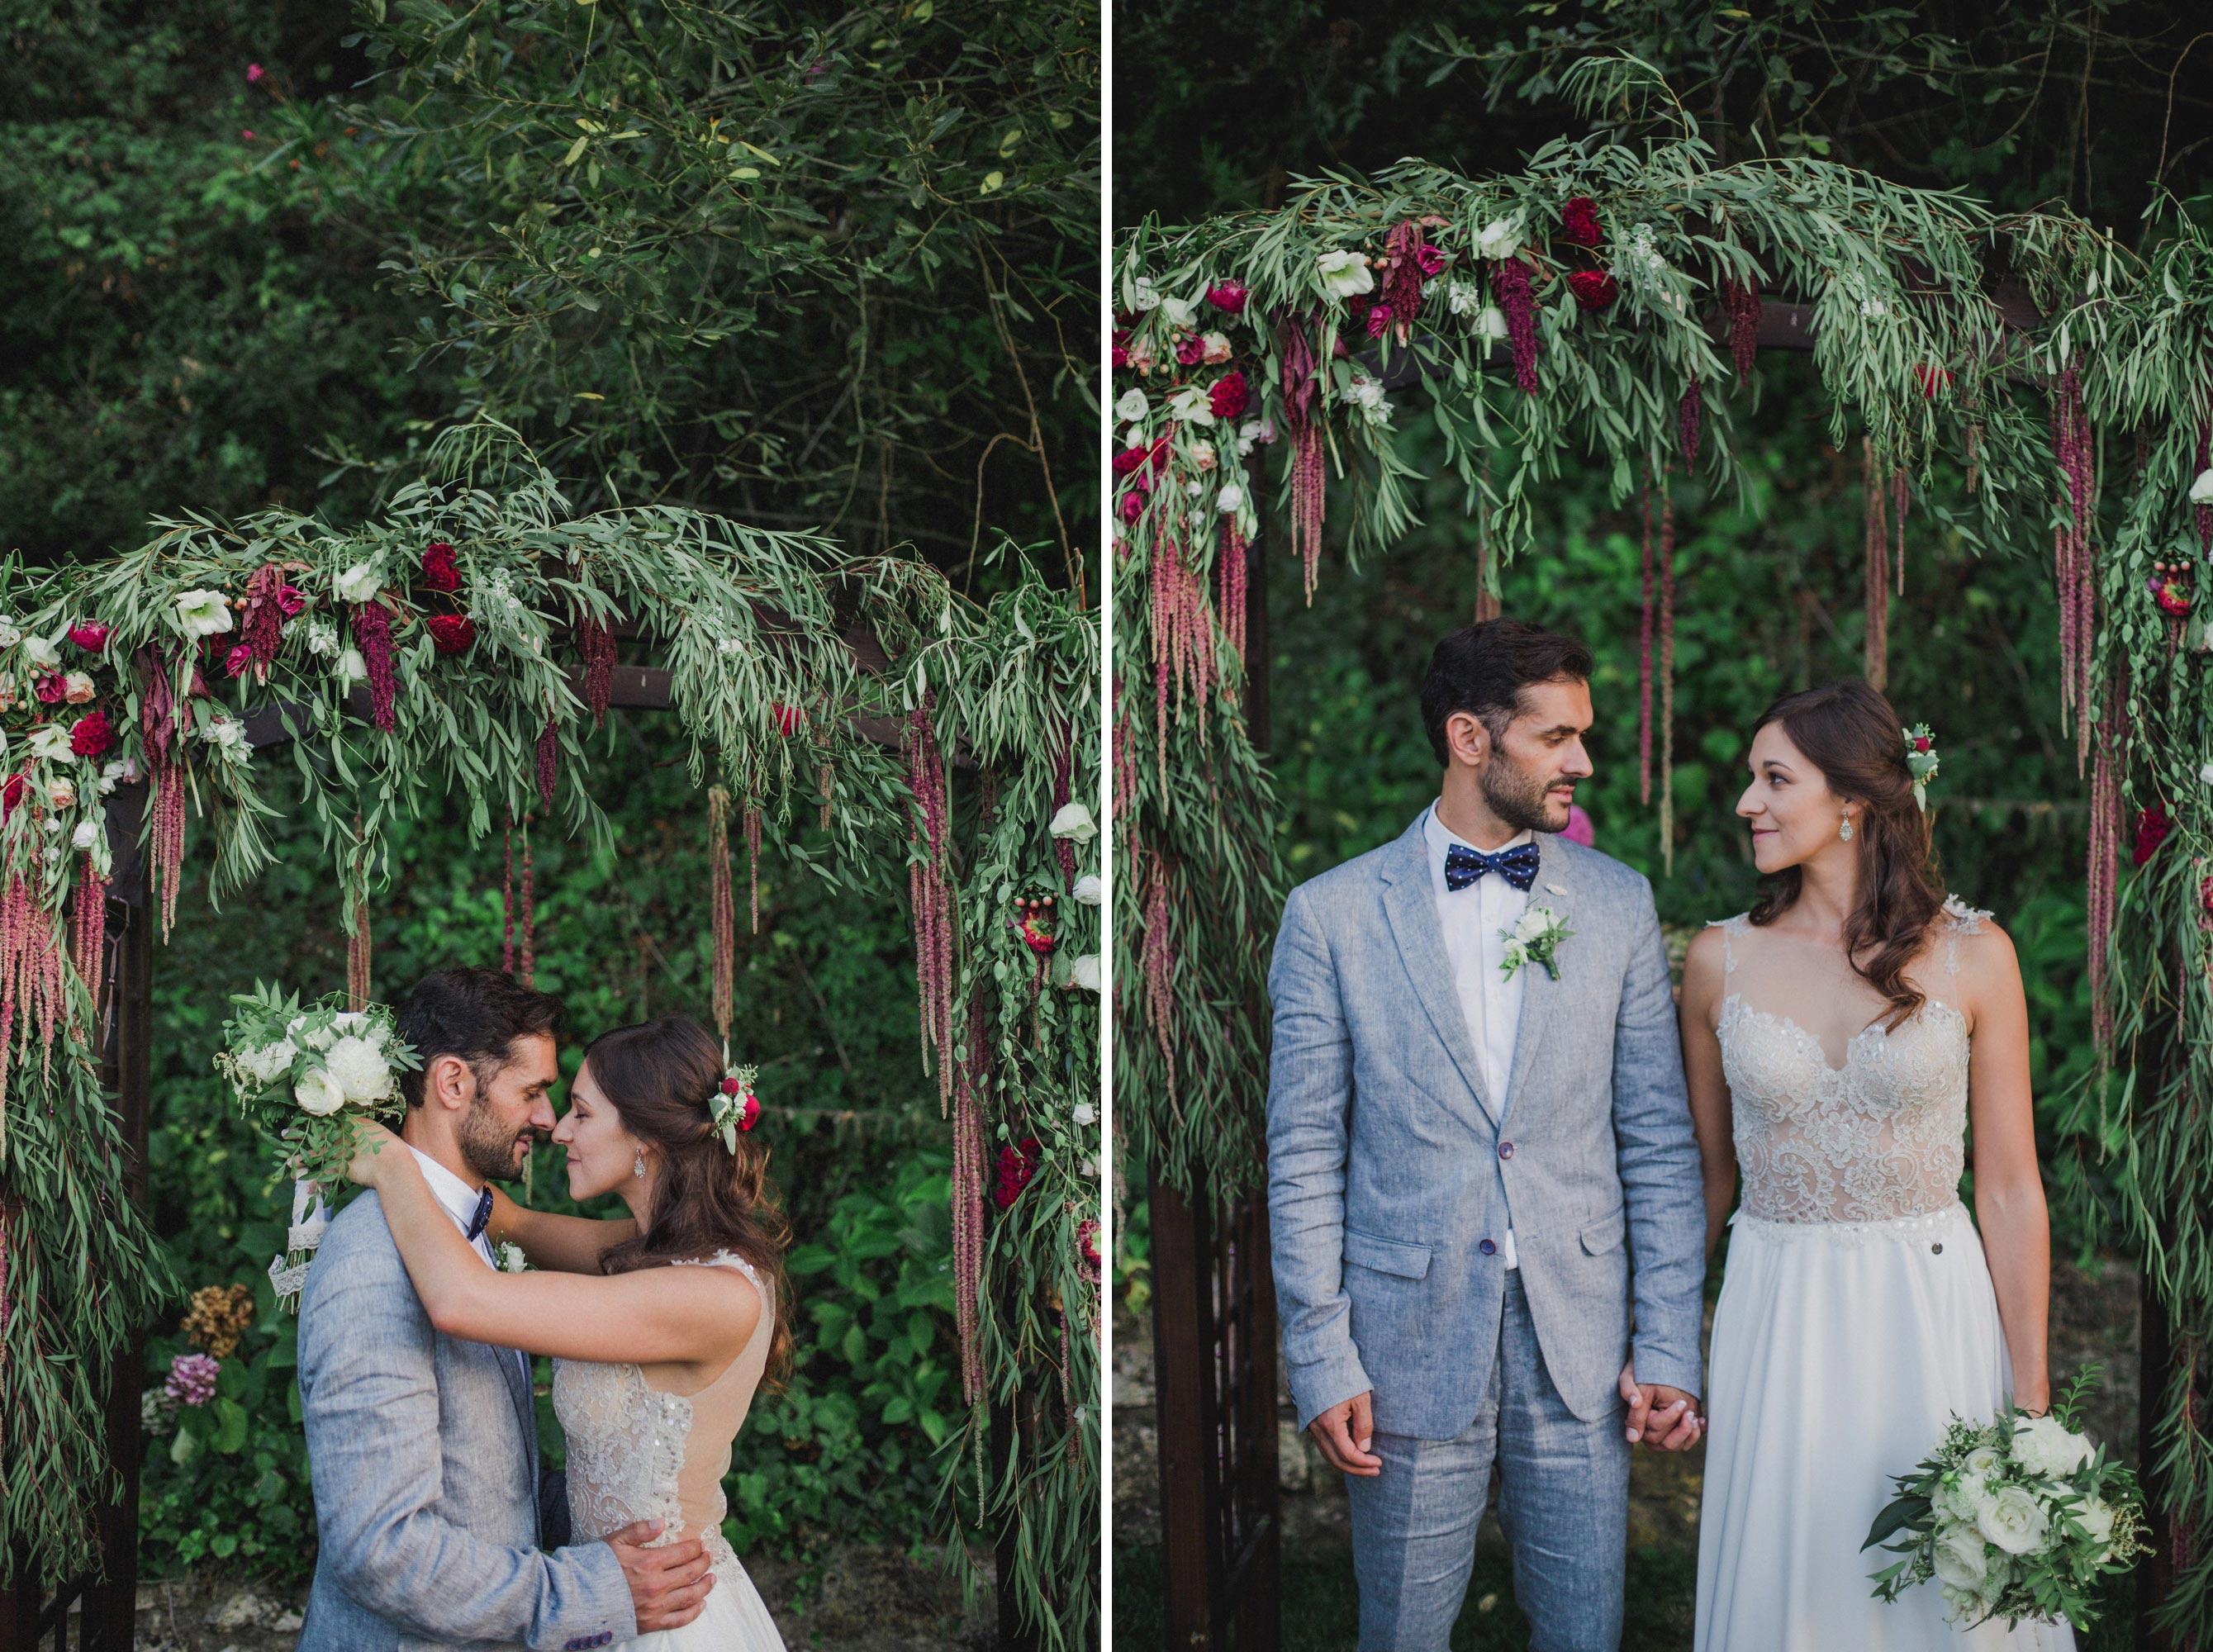 017-carina-e-samuel-wedding-casamento-quinta-dos-rouxinois-rustico-my-fancy-wedding-mafra-malveira-lisboa-sintra-cascais-filipe-santiago-fotografia-fotografo-lifestyle-destination-portugal